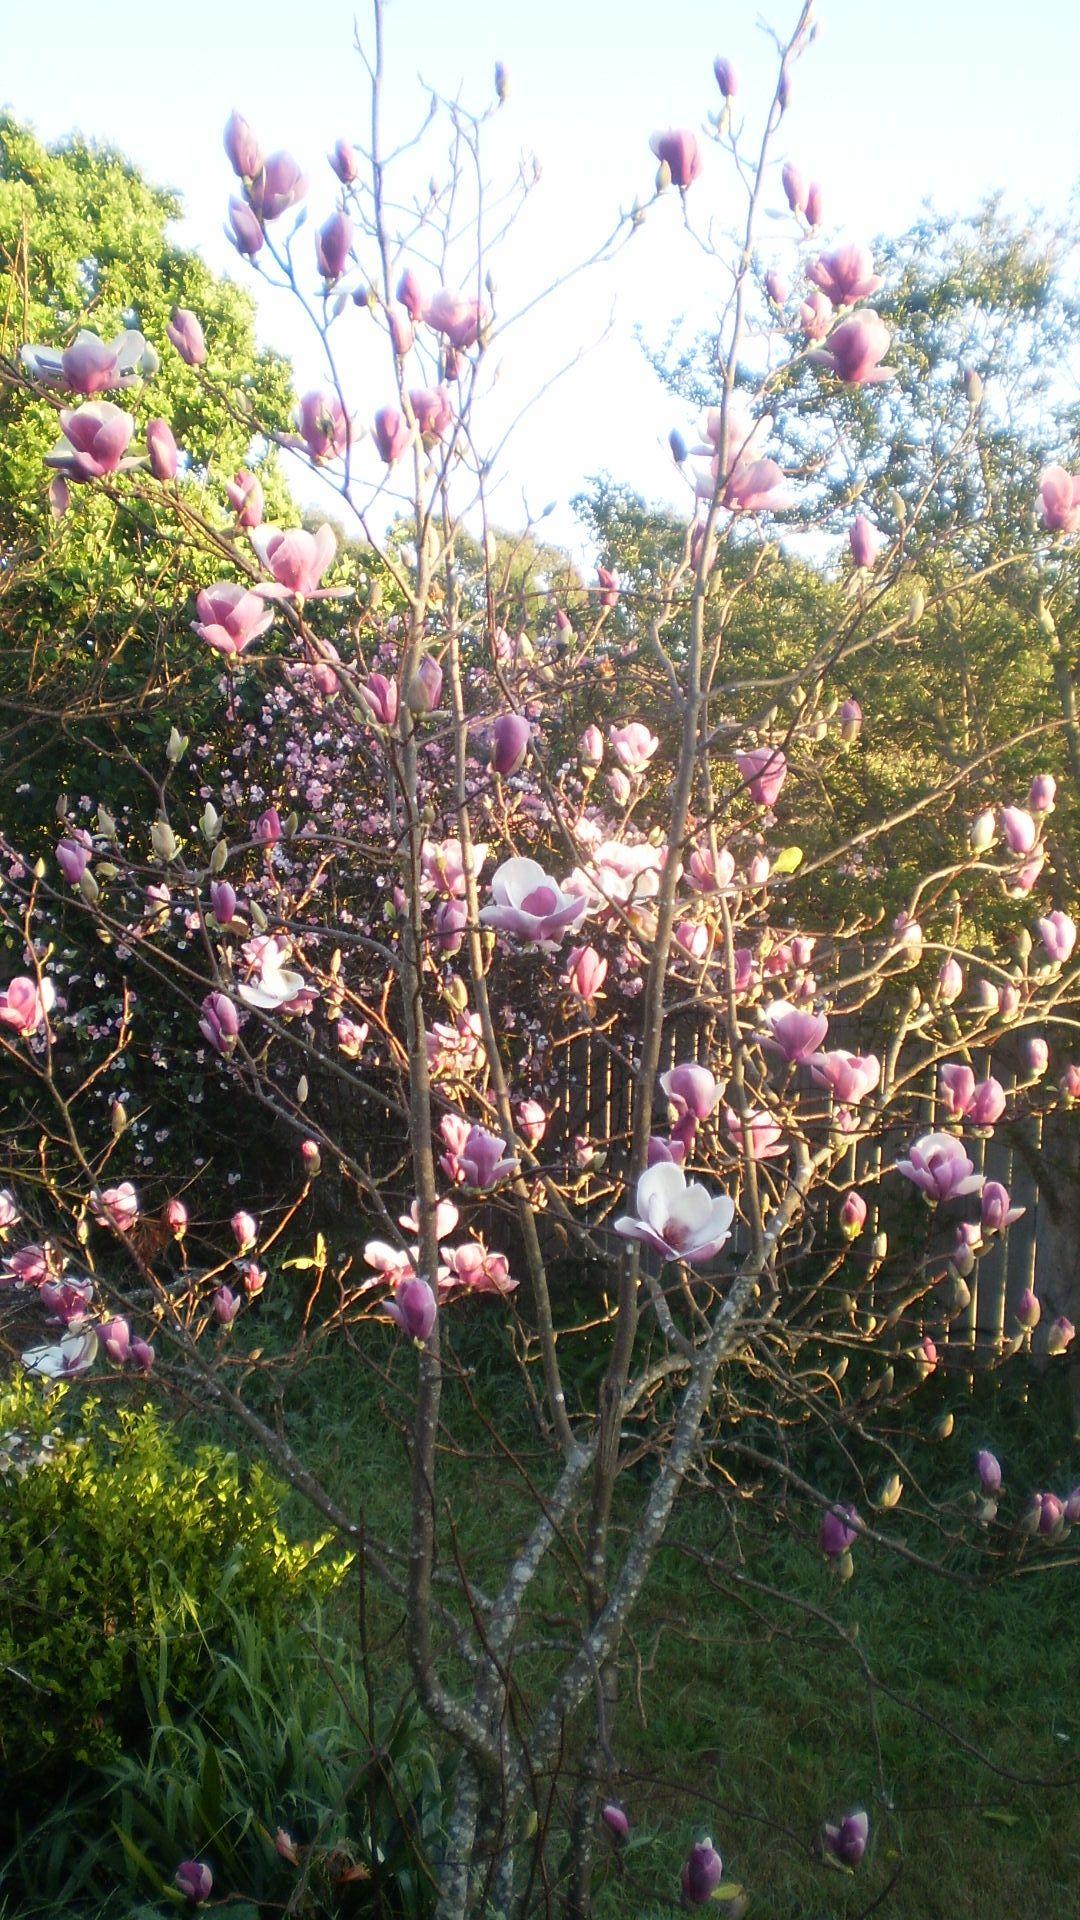 Magnolia foreground. Chaenomeles Apple Blossom background